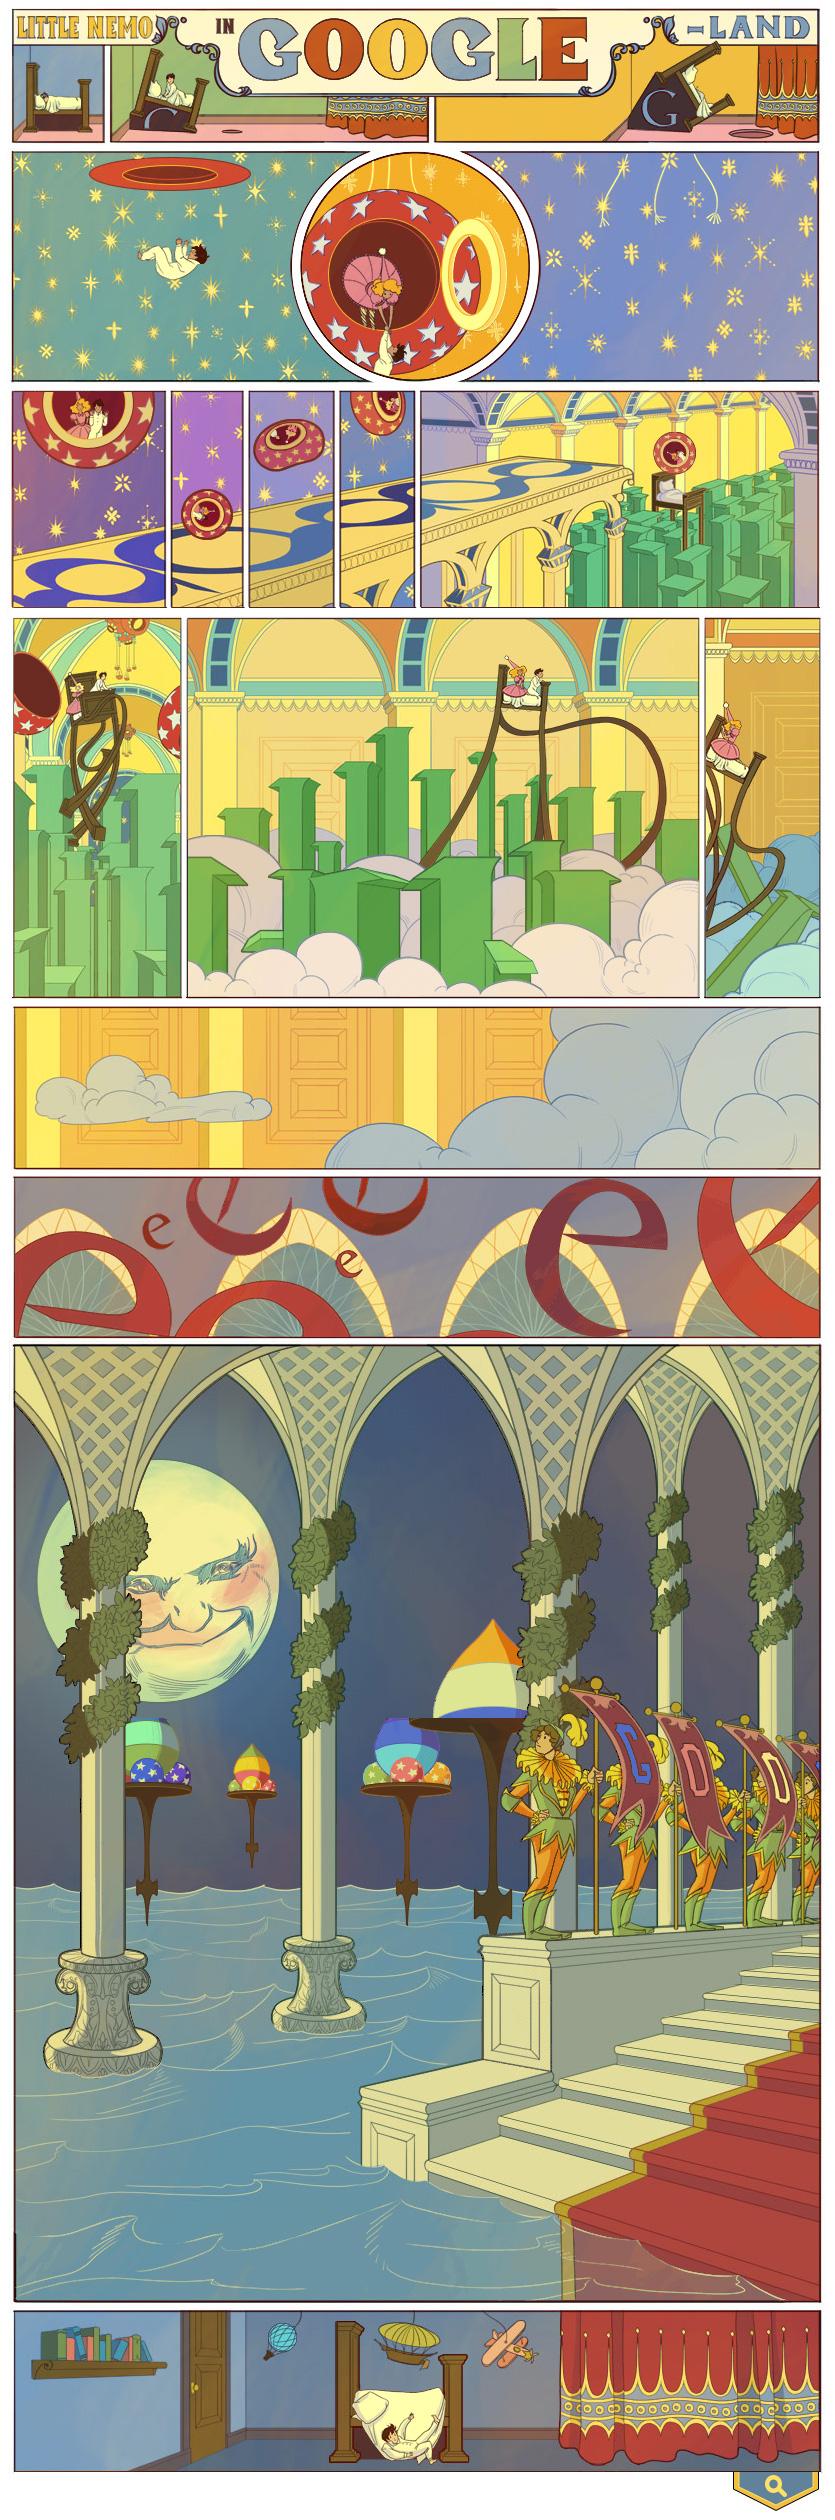 Little NEMO by Winsor McKay (Google Doodle)